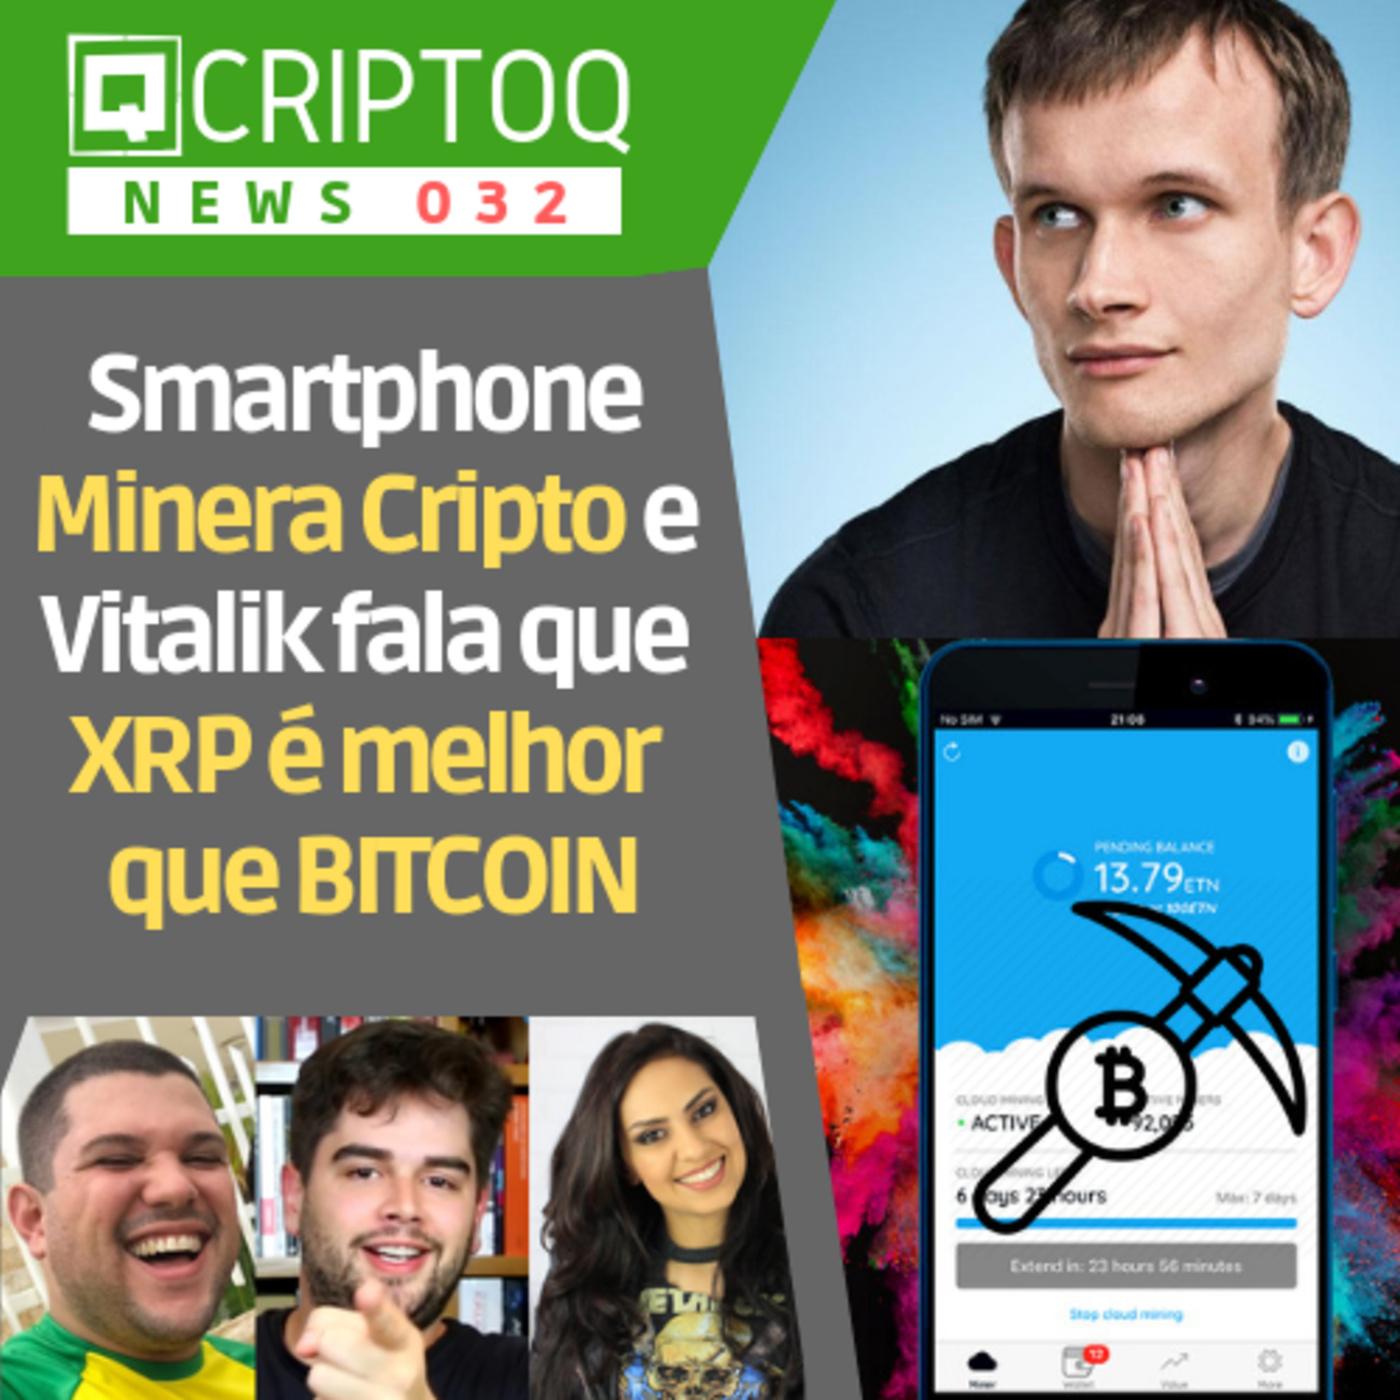 Smartphone que minera Criptomoeda e Vitalik Buterin falando que XRP é melhor que Bitcoin - CriptoQ Podcast NEWS 032